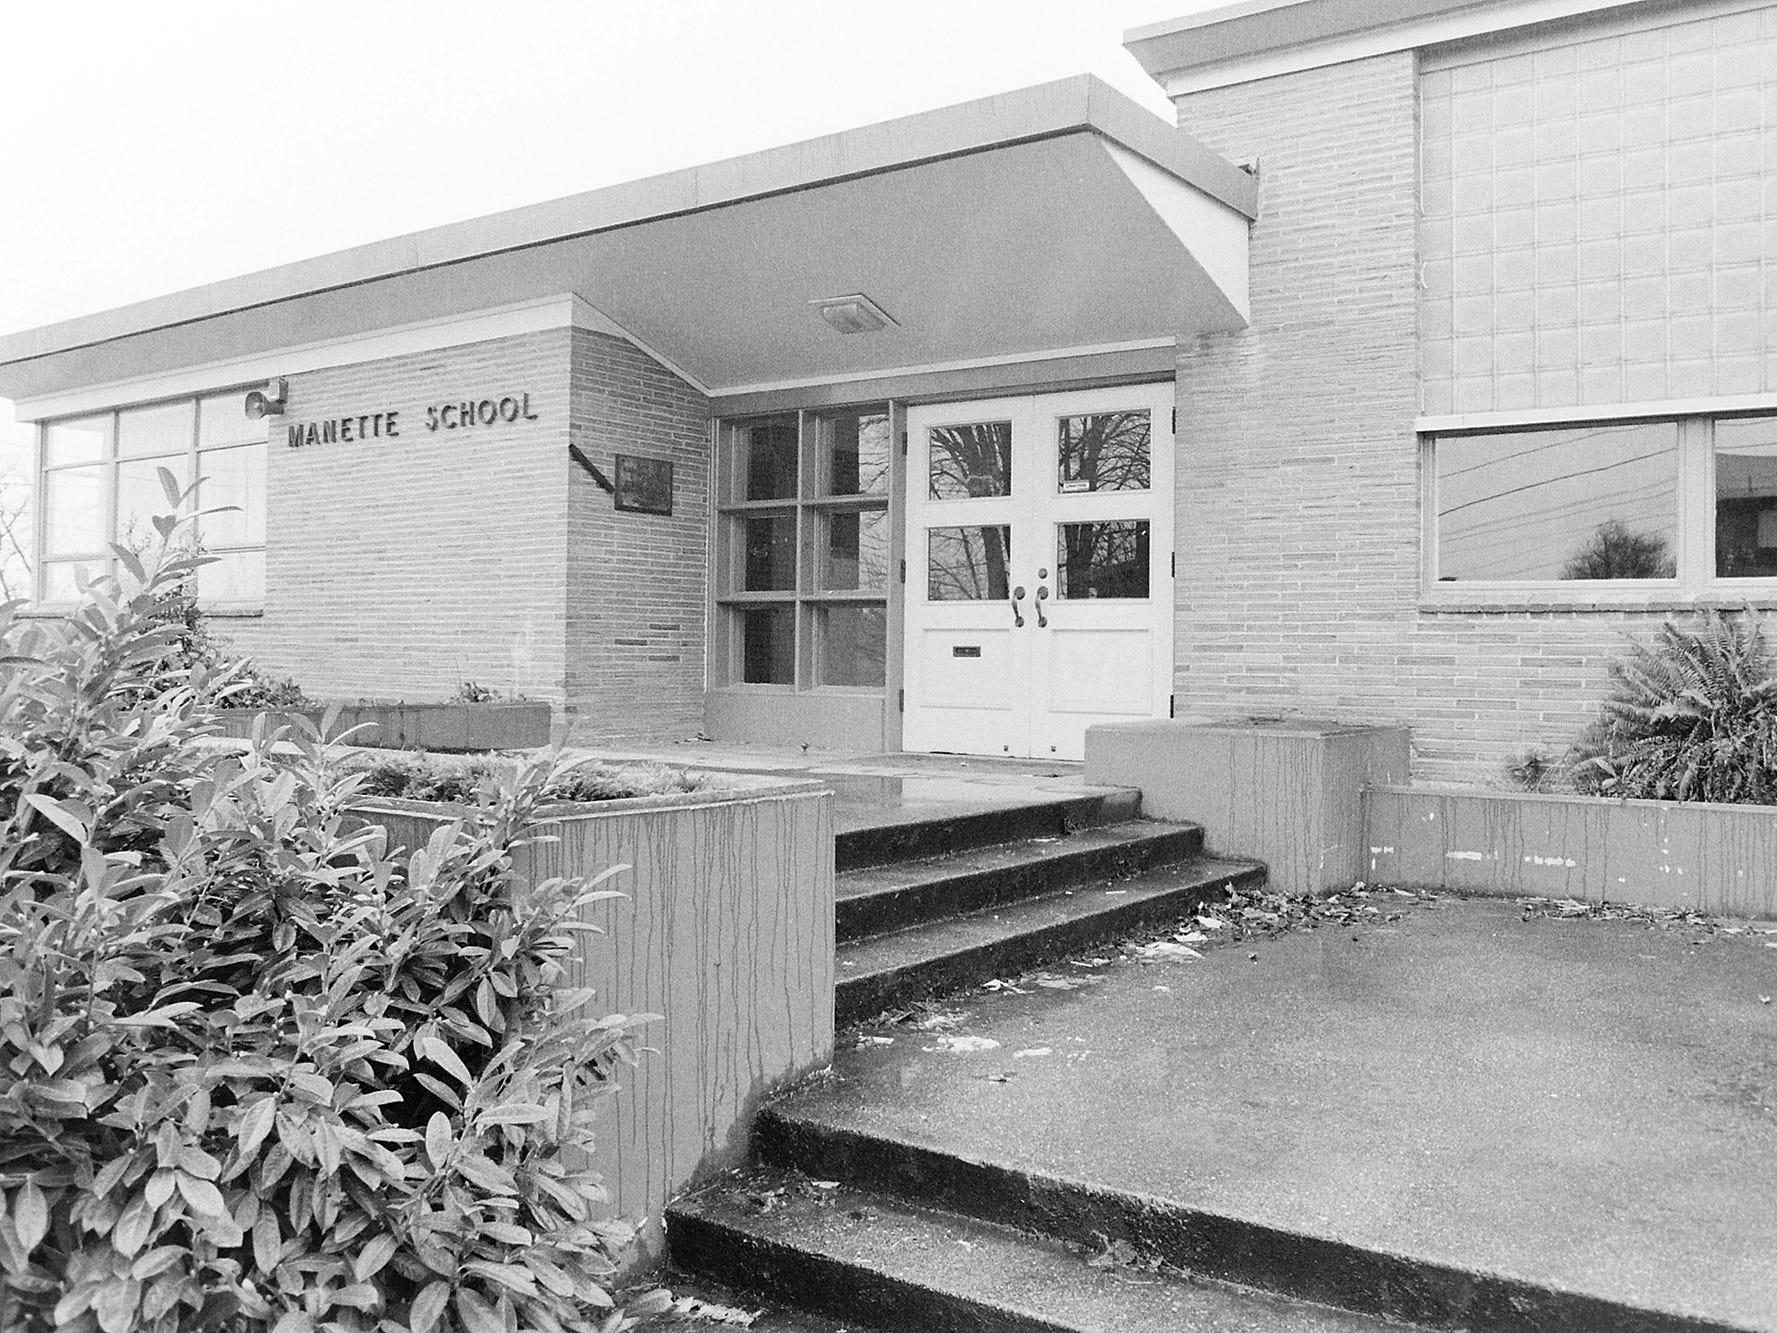 02/23/84Manette School